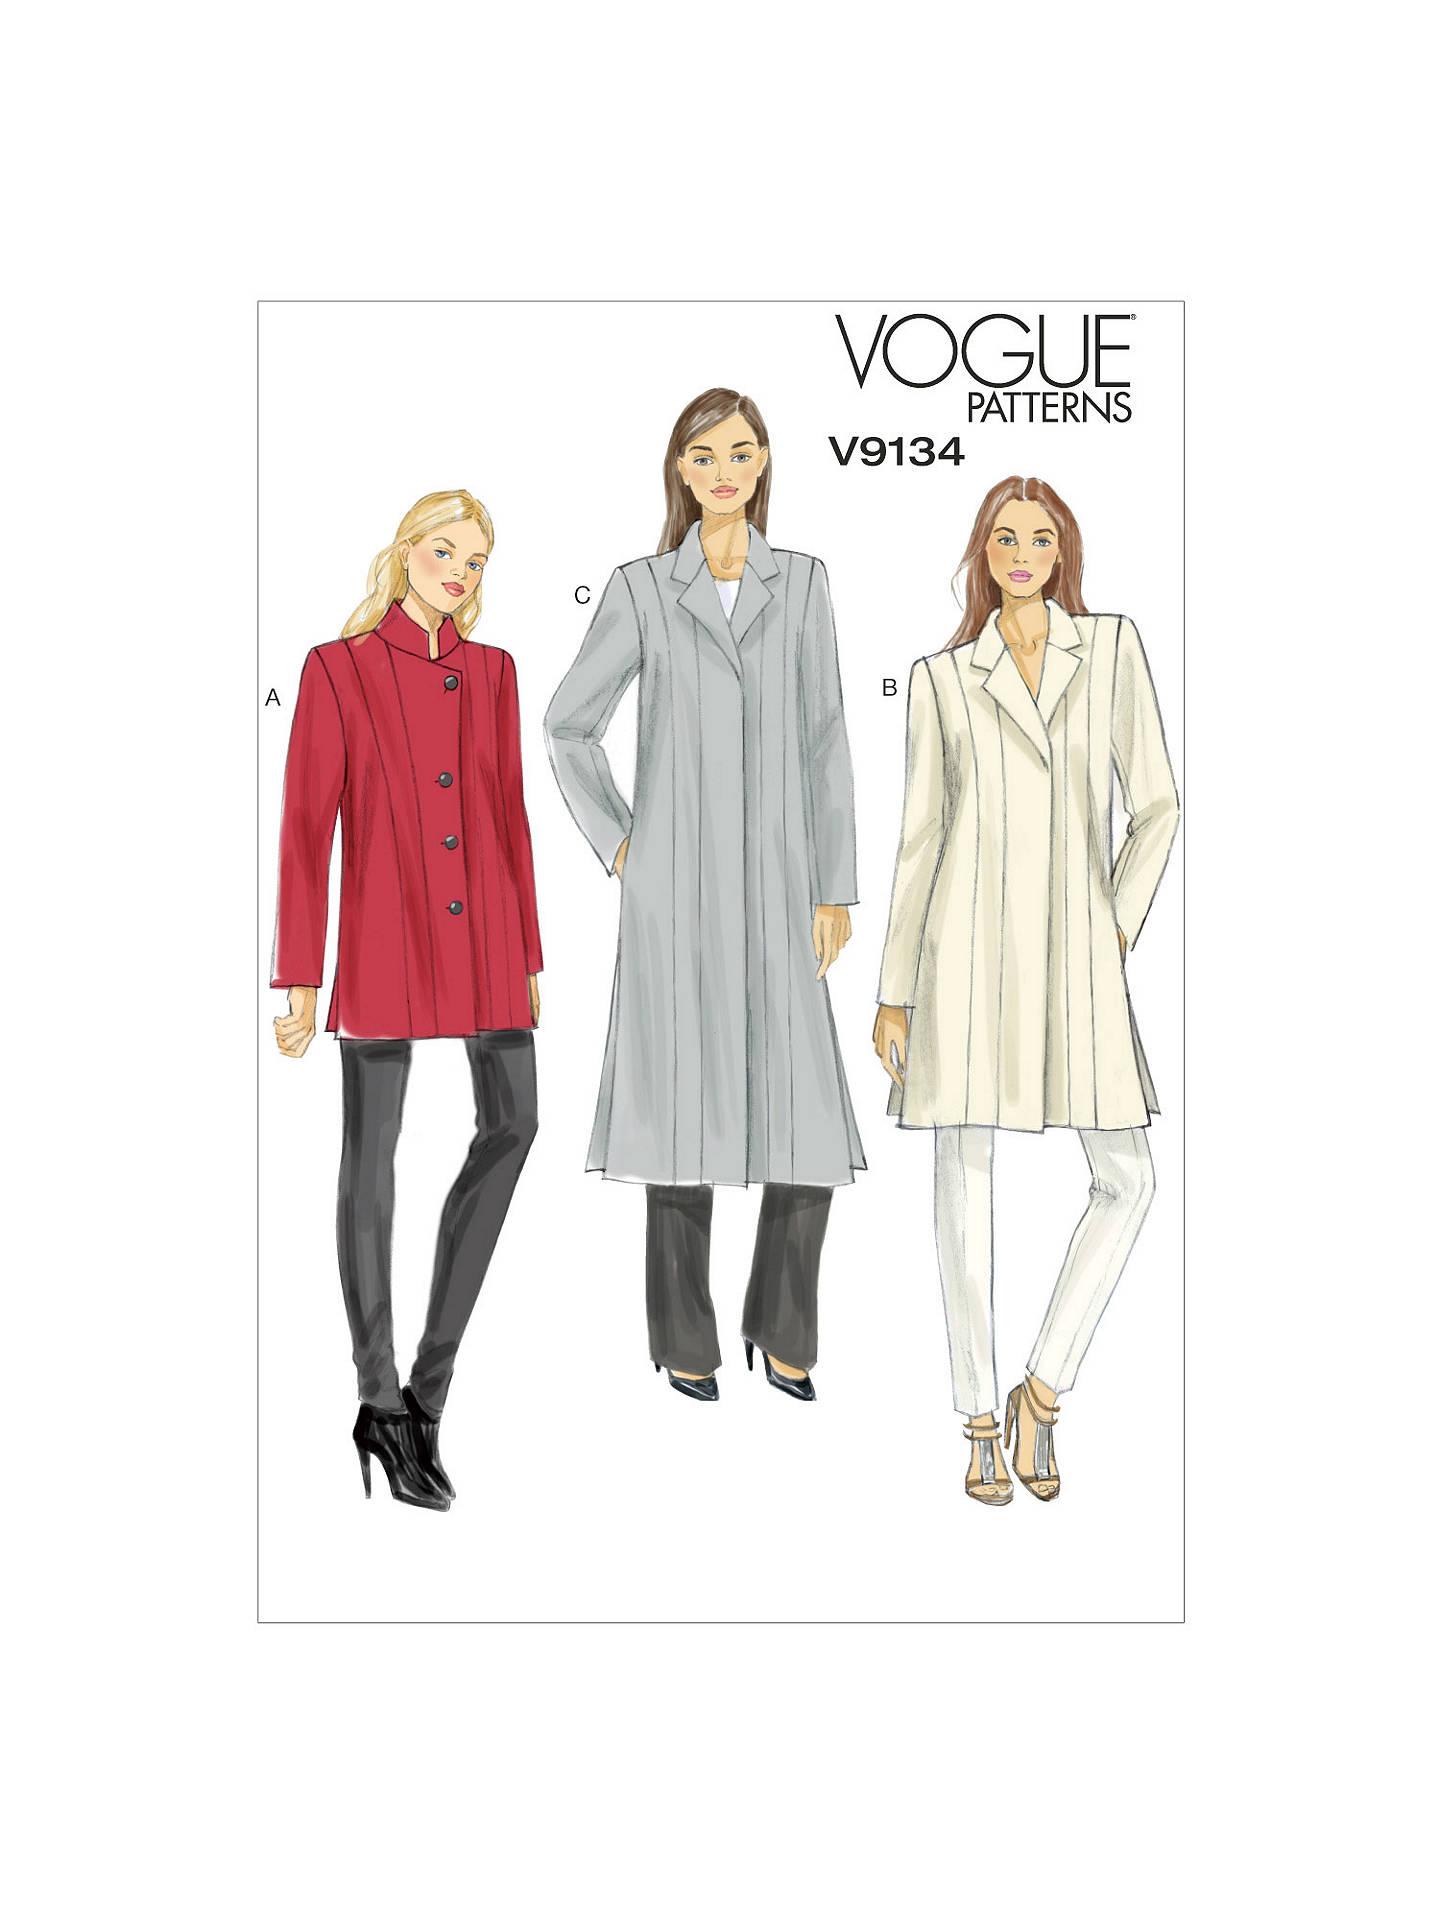 Vogue Women\'s Smart Coat Sewing Pattern, 9134 at John Lewis & Partners